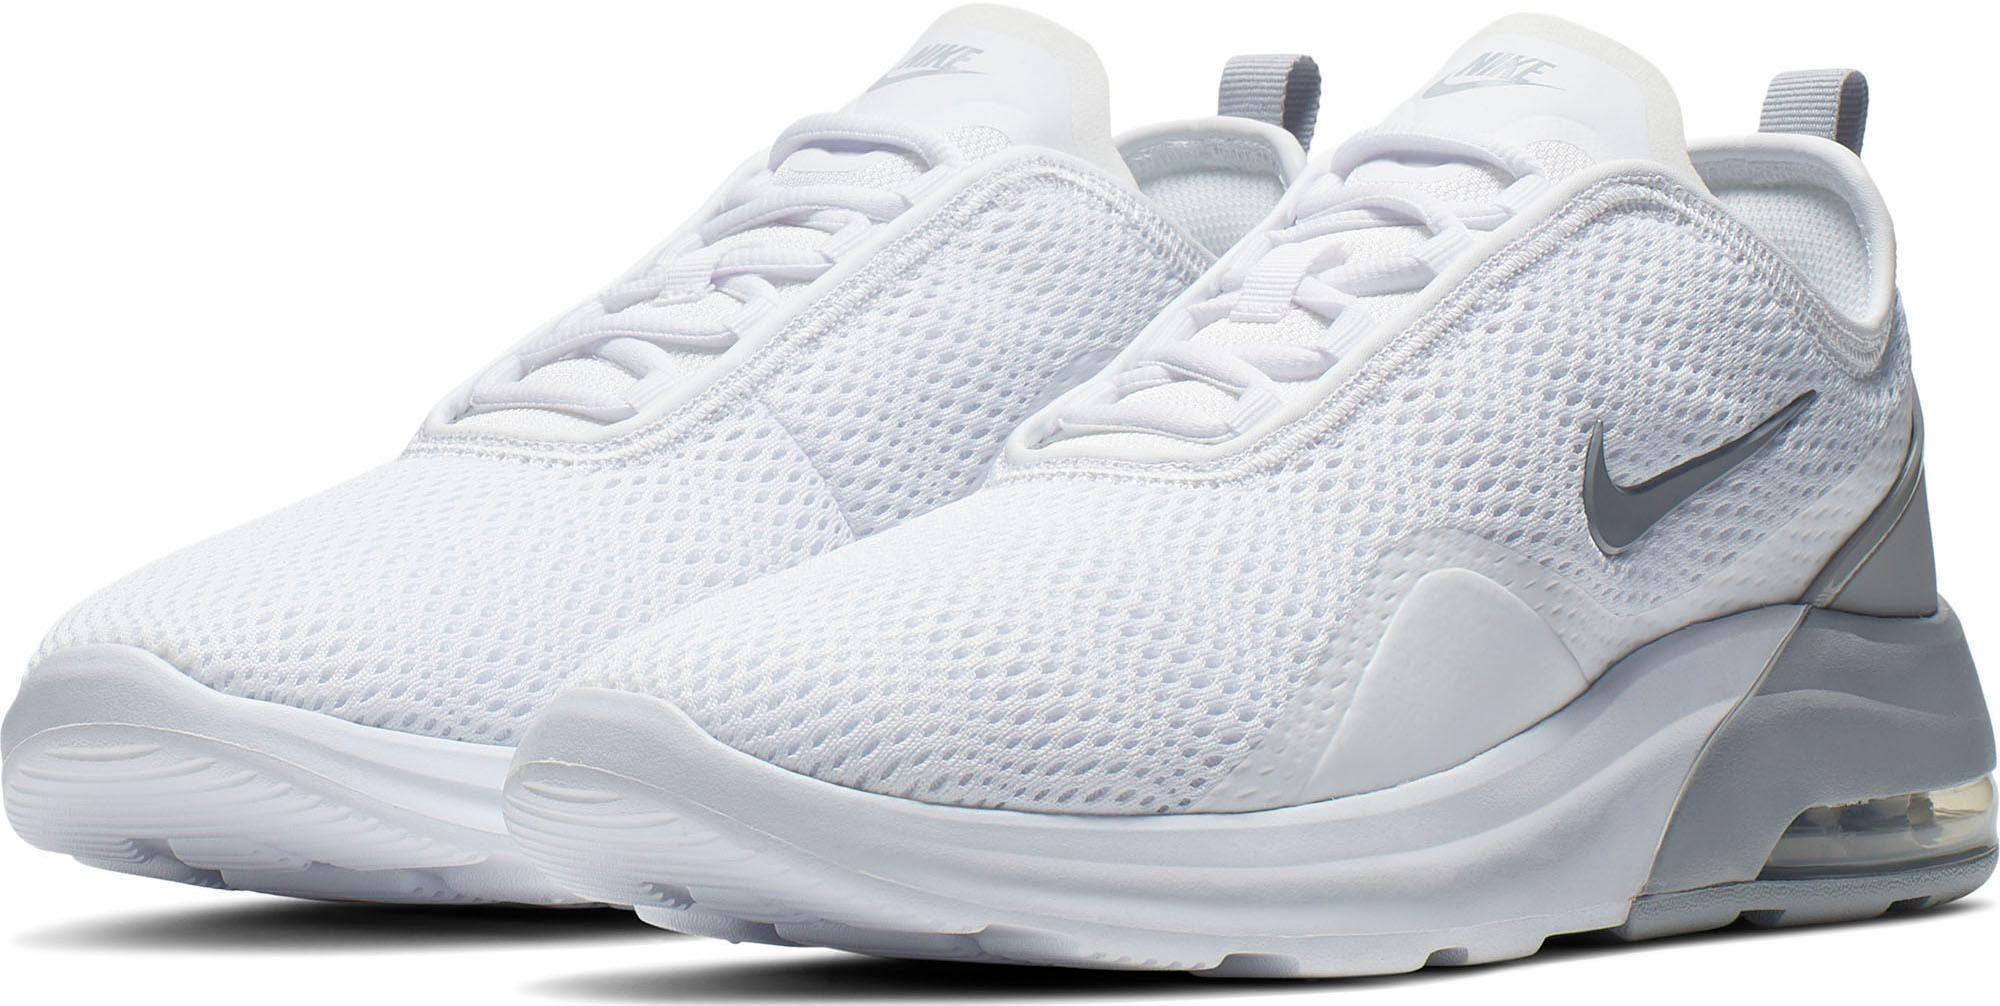 Nike Sportswear »Air Max Motion 2« Sneaker kaufen   OTTO